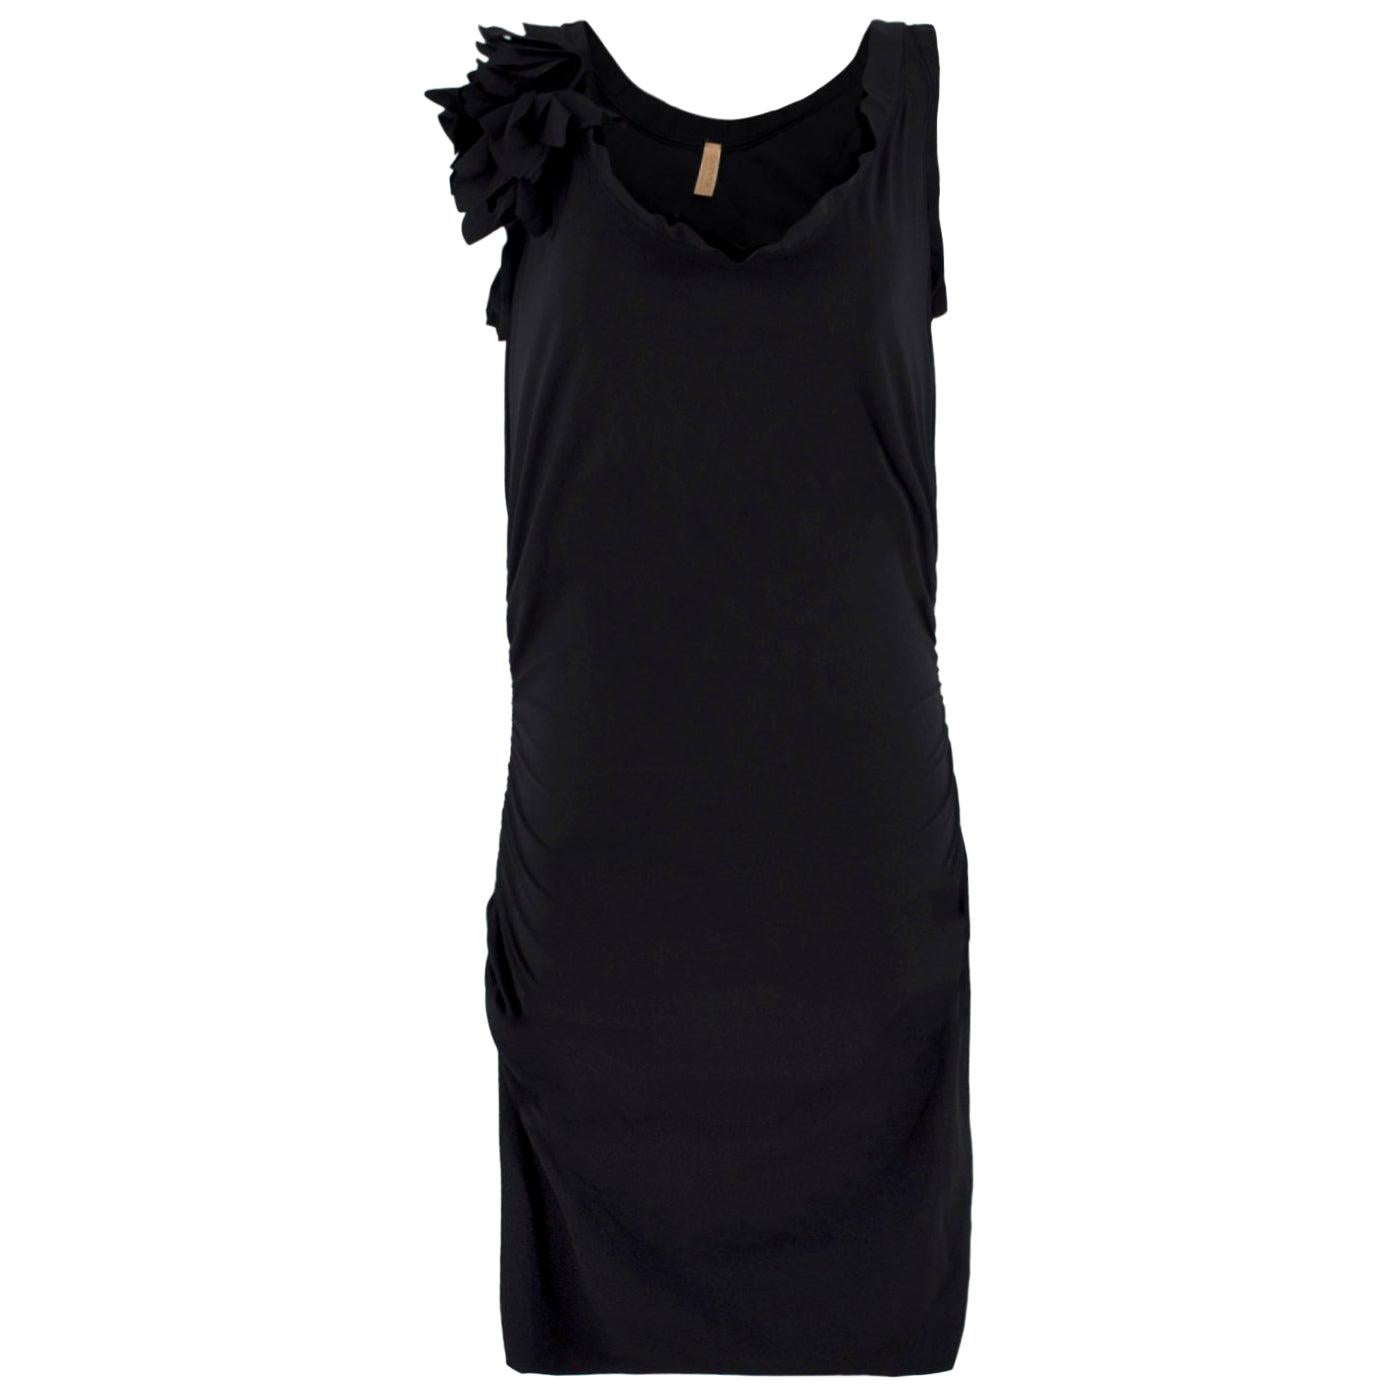 Lanvin Black Ruched Dress - Size Estimated M